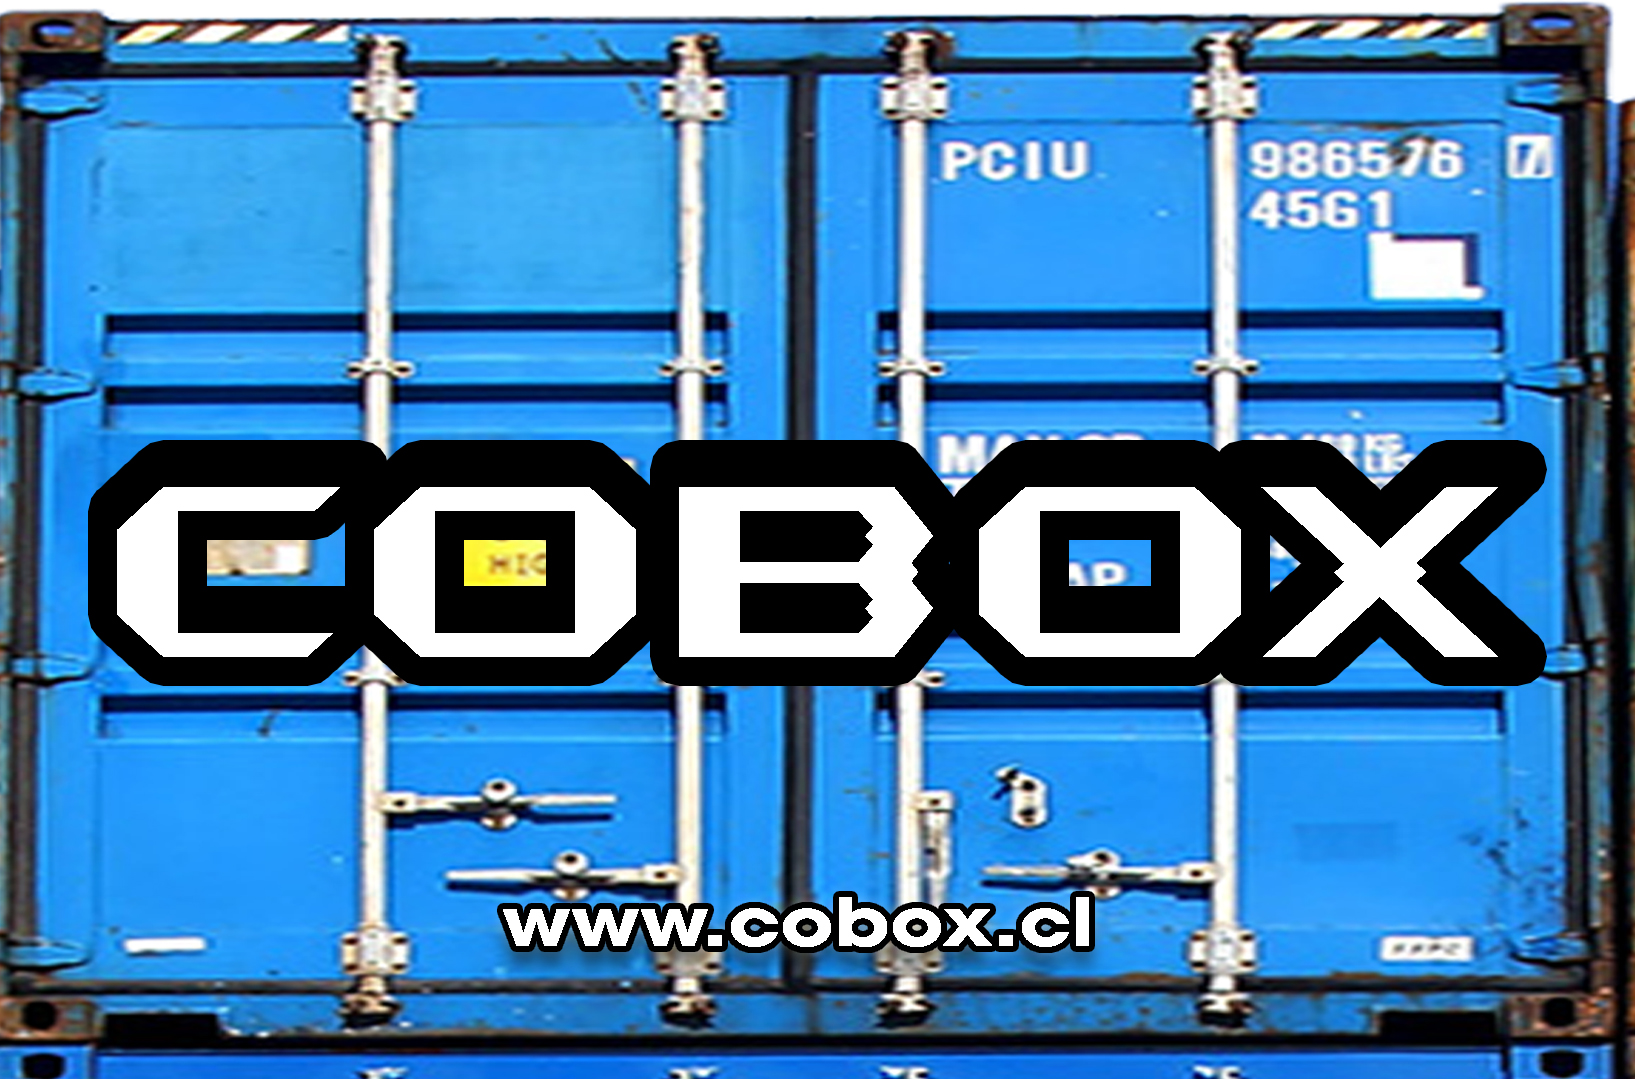 Container Habitables Nuevos, Container Maritimos Usados - cobox.cl Contenedores.